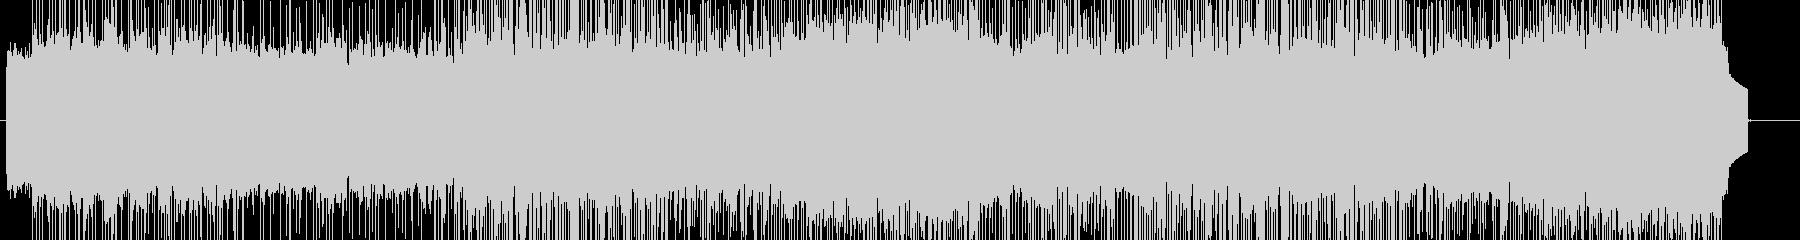 「HARD/HEAVY」BGM33の未再生の波形